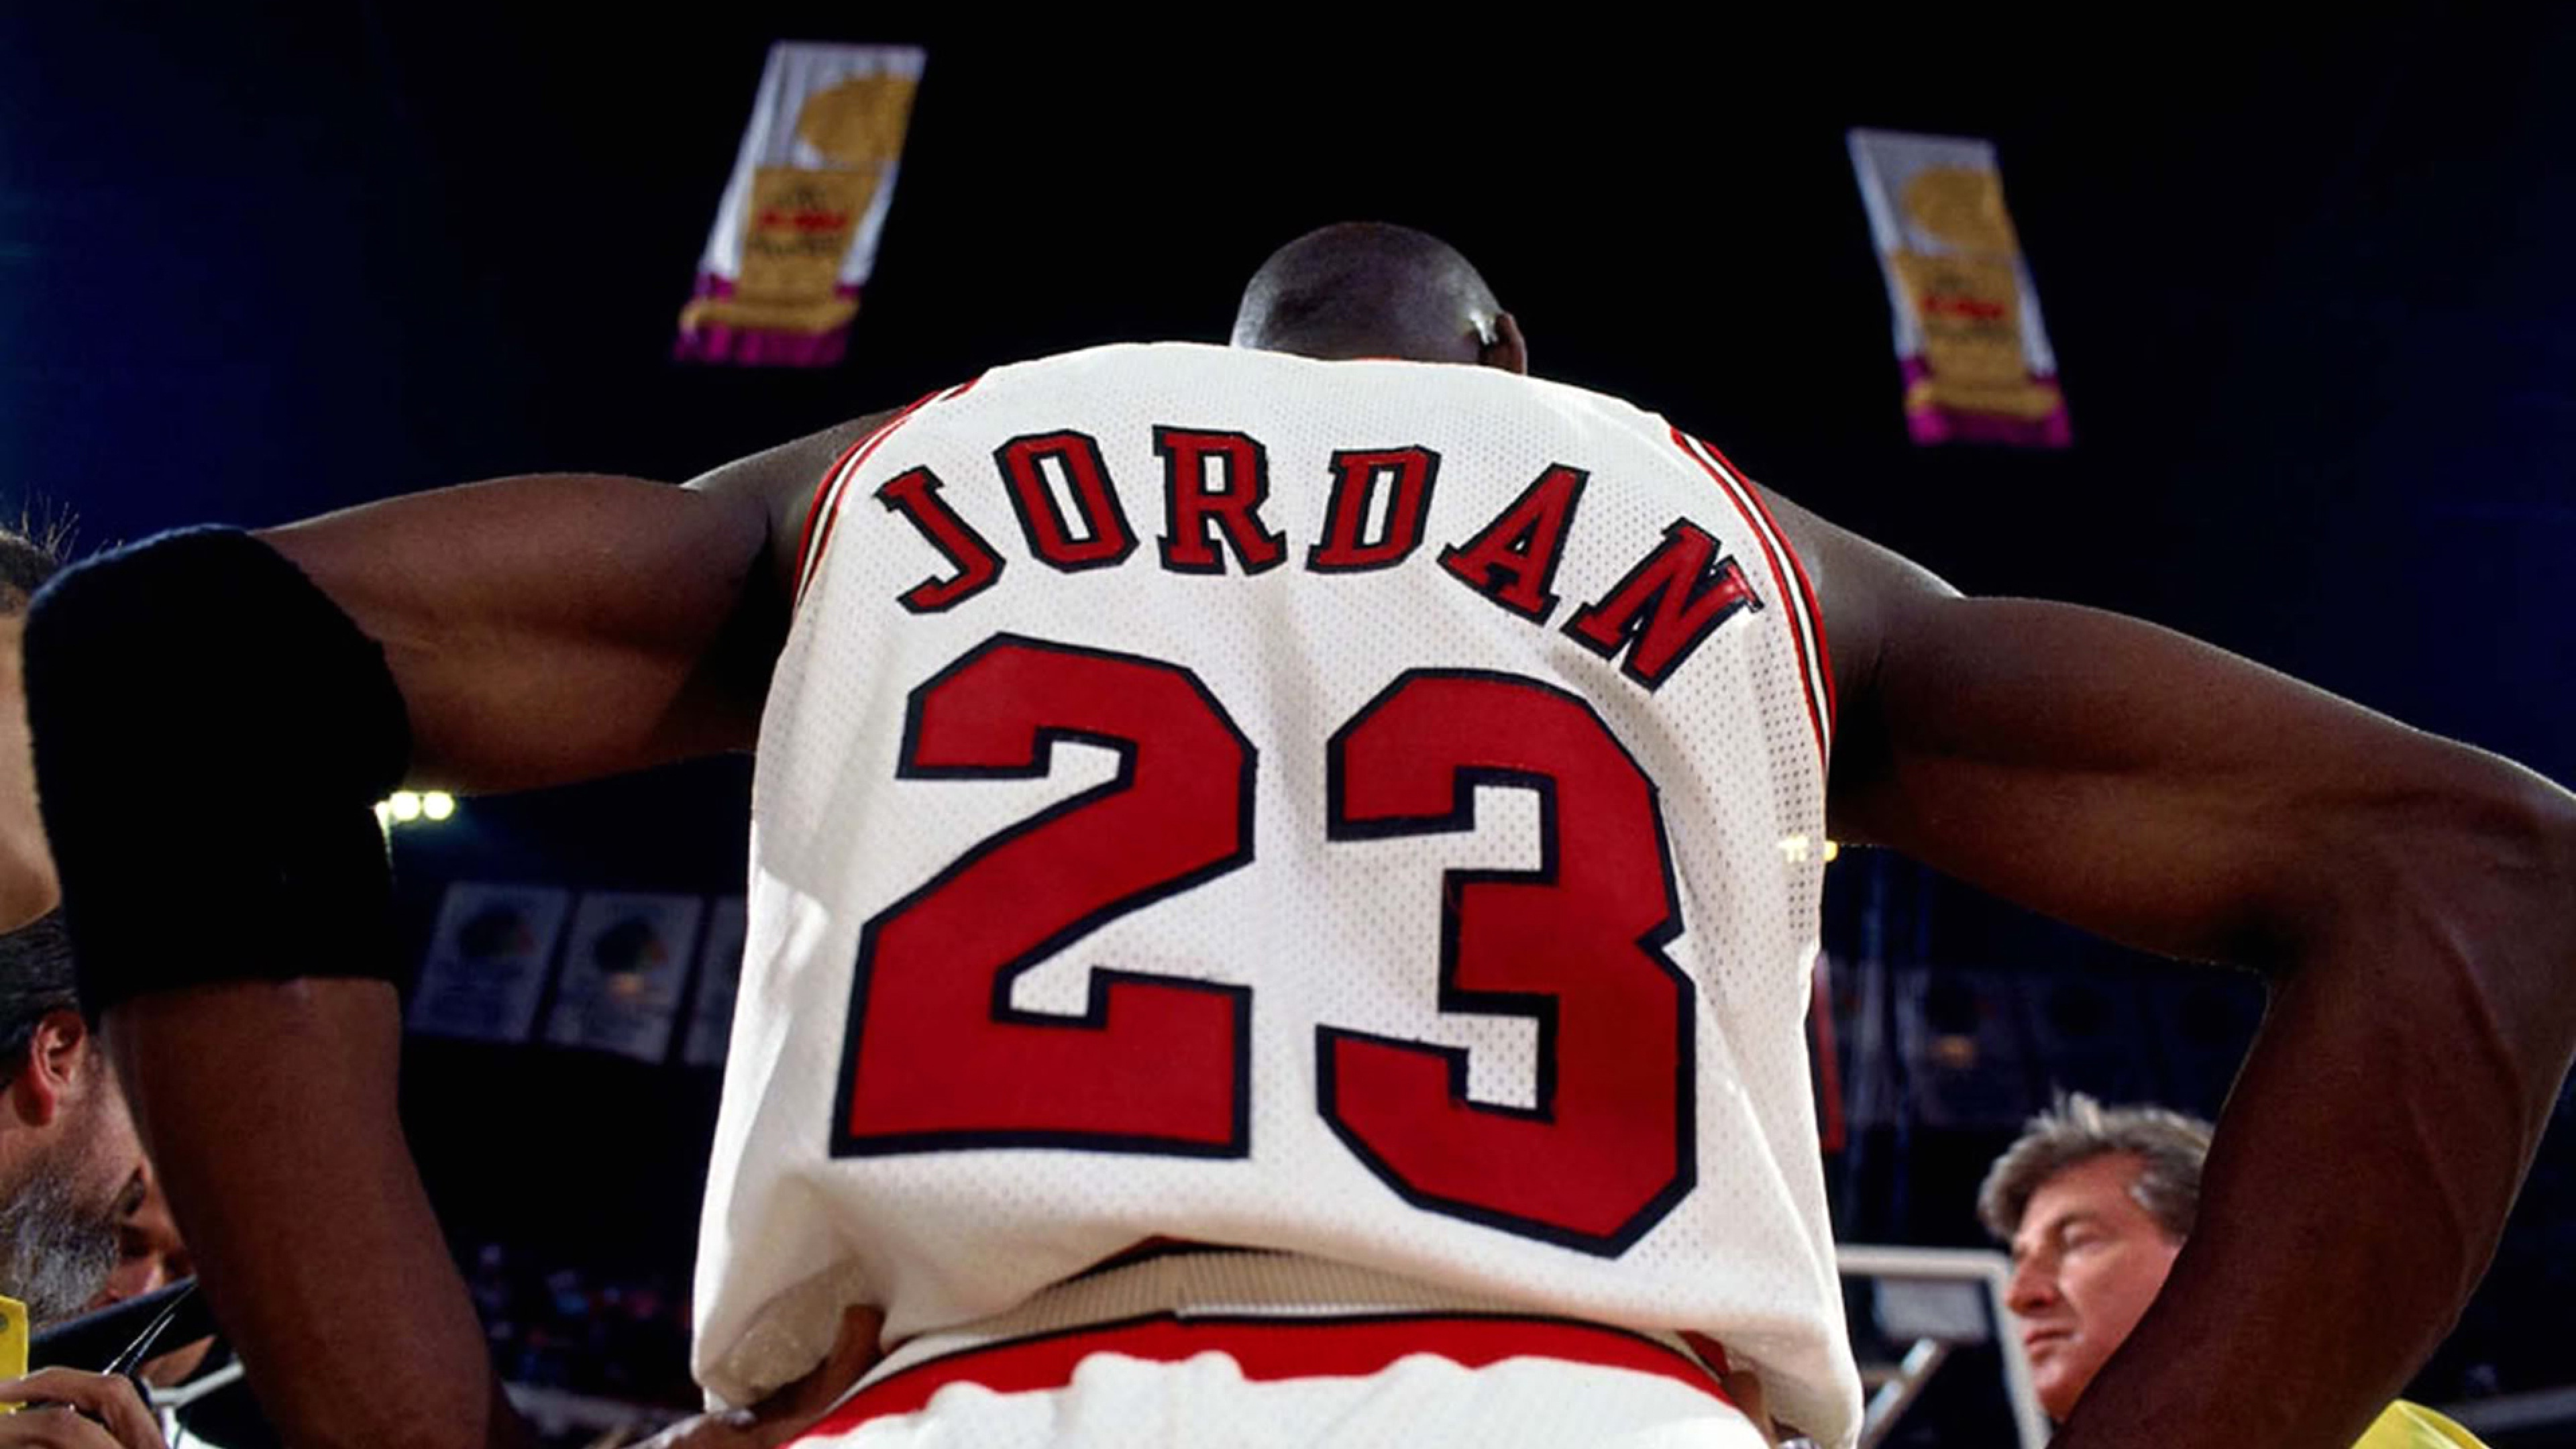 jordan Nba Basketball Jersey Logo Wallpaper Background 4K Ultra 3840x2160